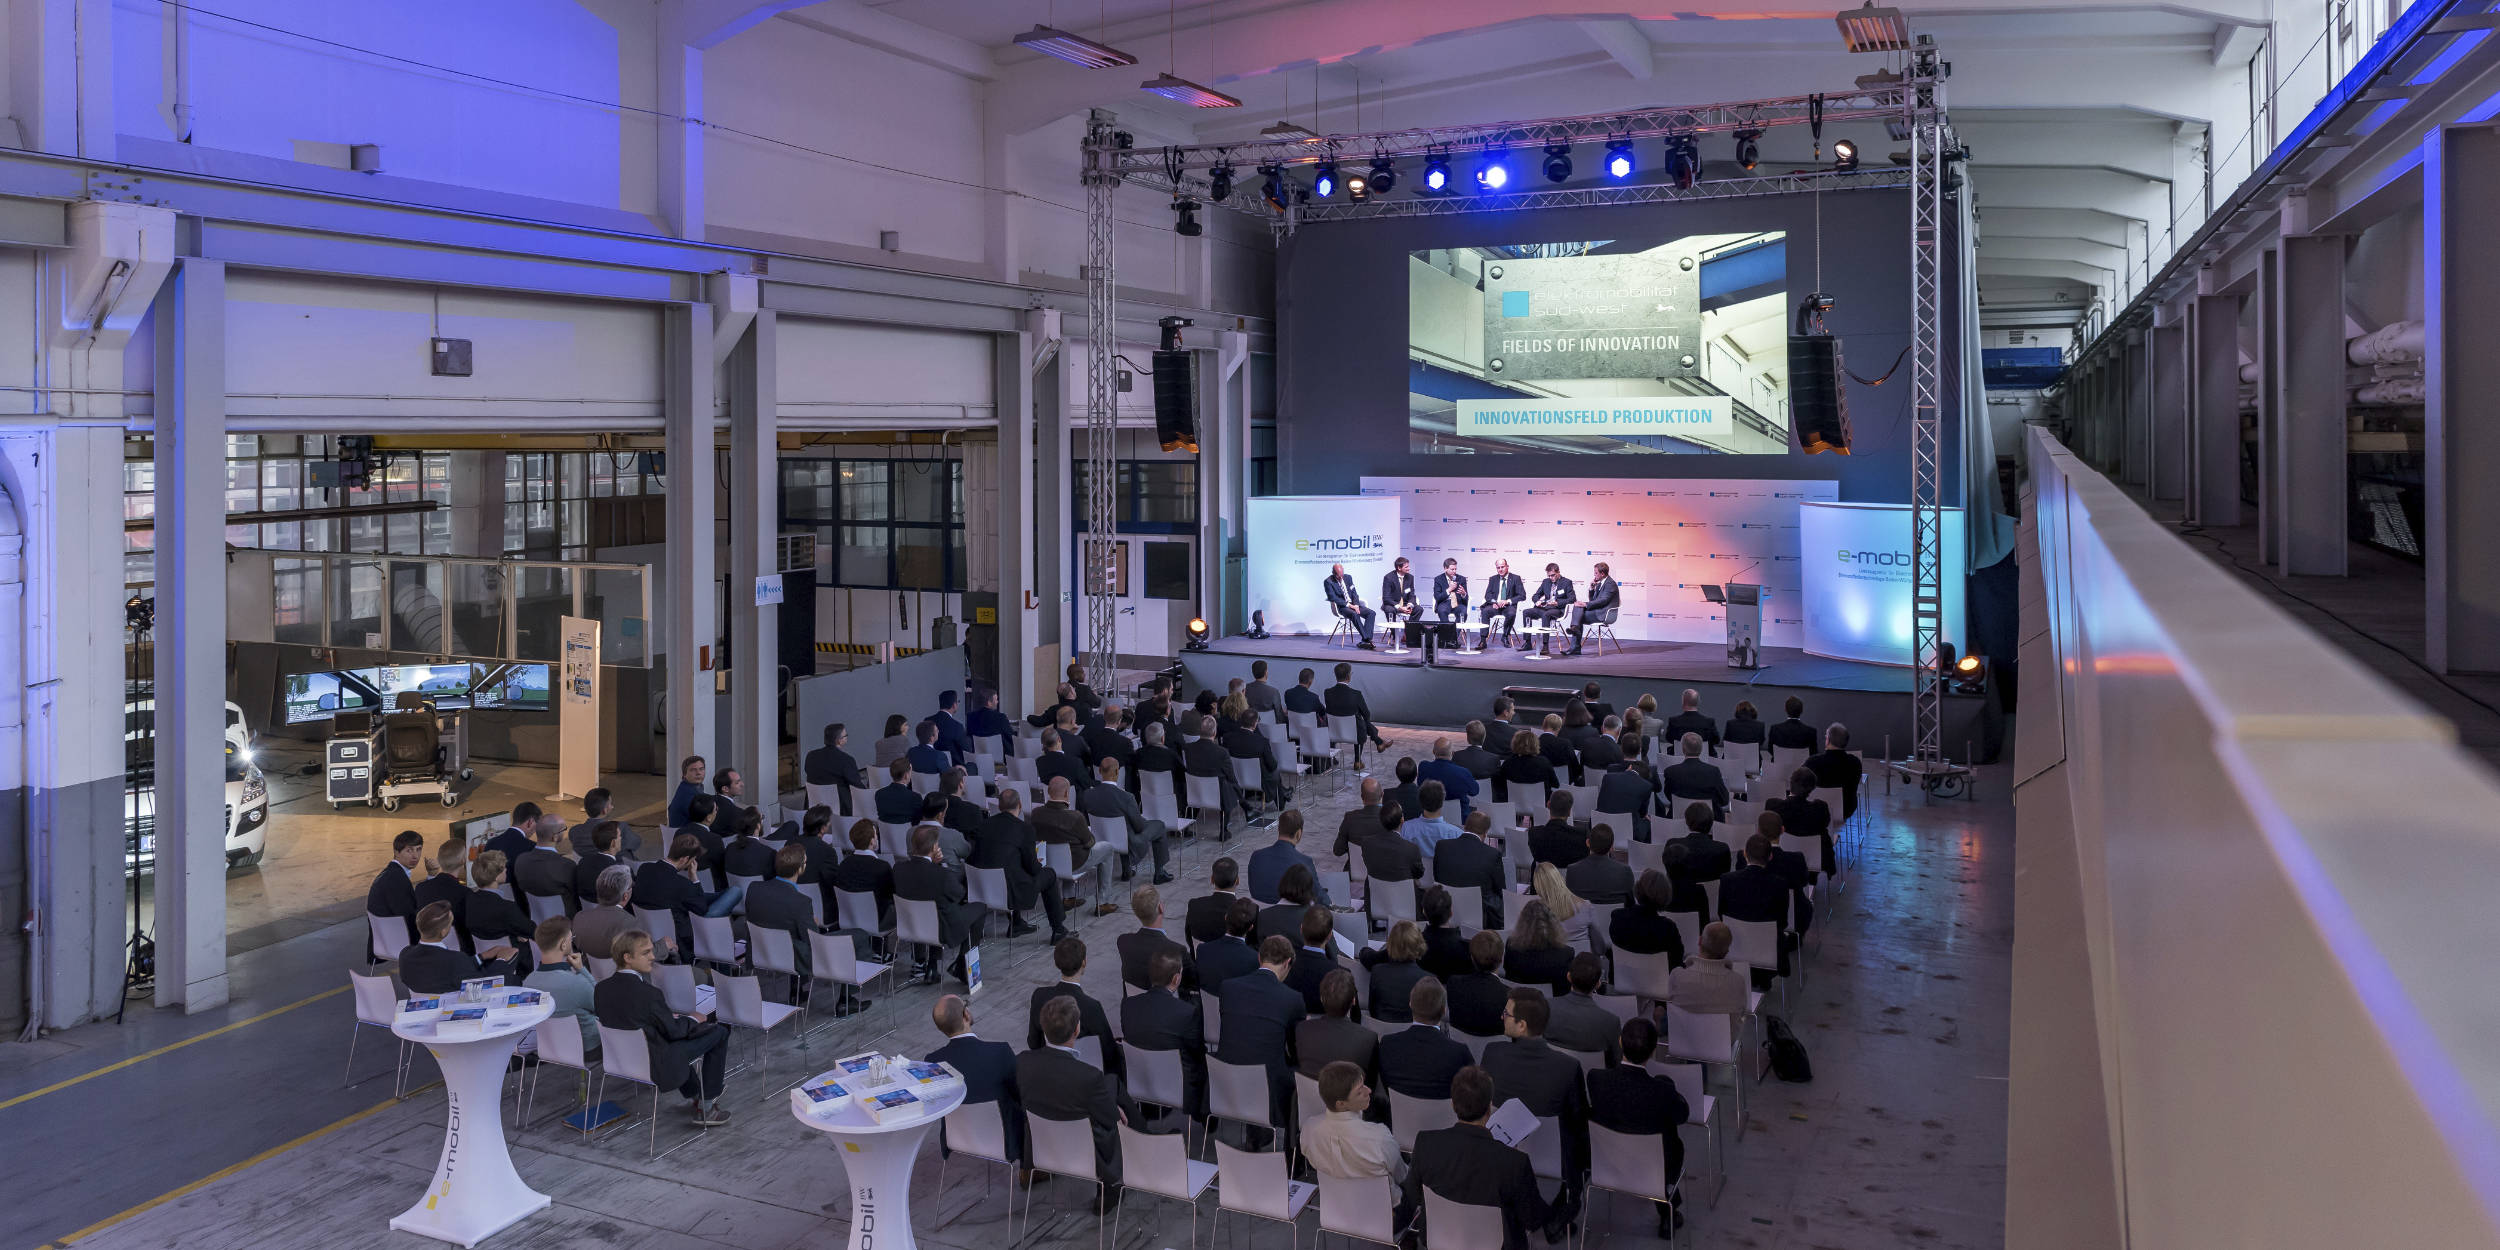 Eventfotografie Stuttgart und Umgebung Fields Of Innovation e-mobil BW Innovations Messe Ludwigsburg E-Mobilität Elektro Autos Elektro